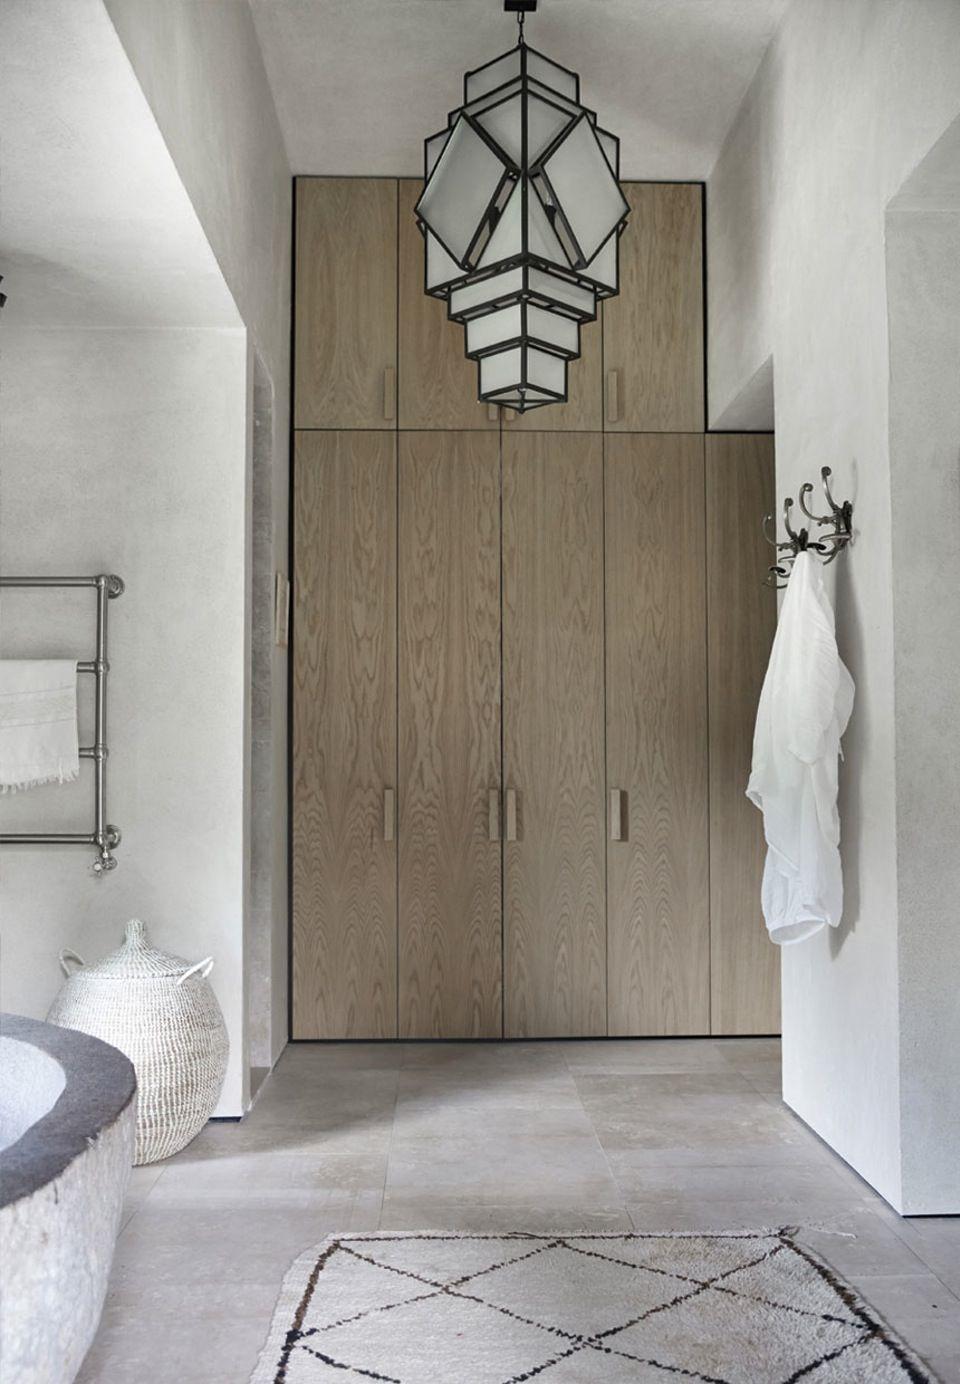 Art deco hallway lights  stefano moreno et lionel jadot architectes  residence privé